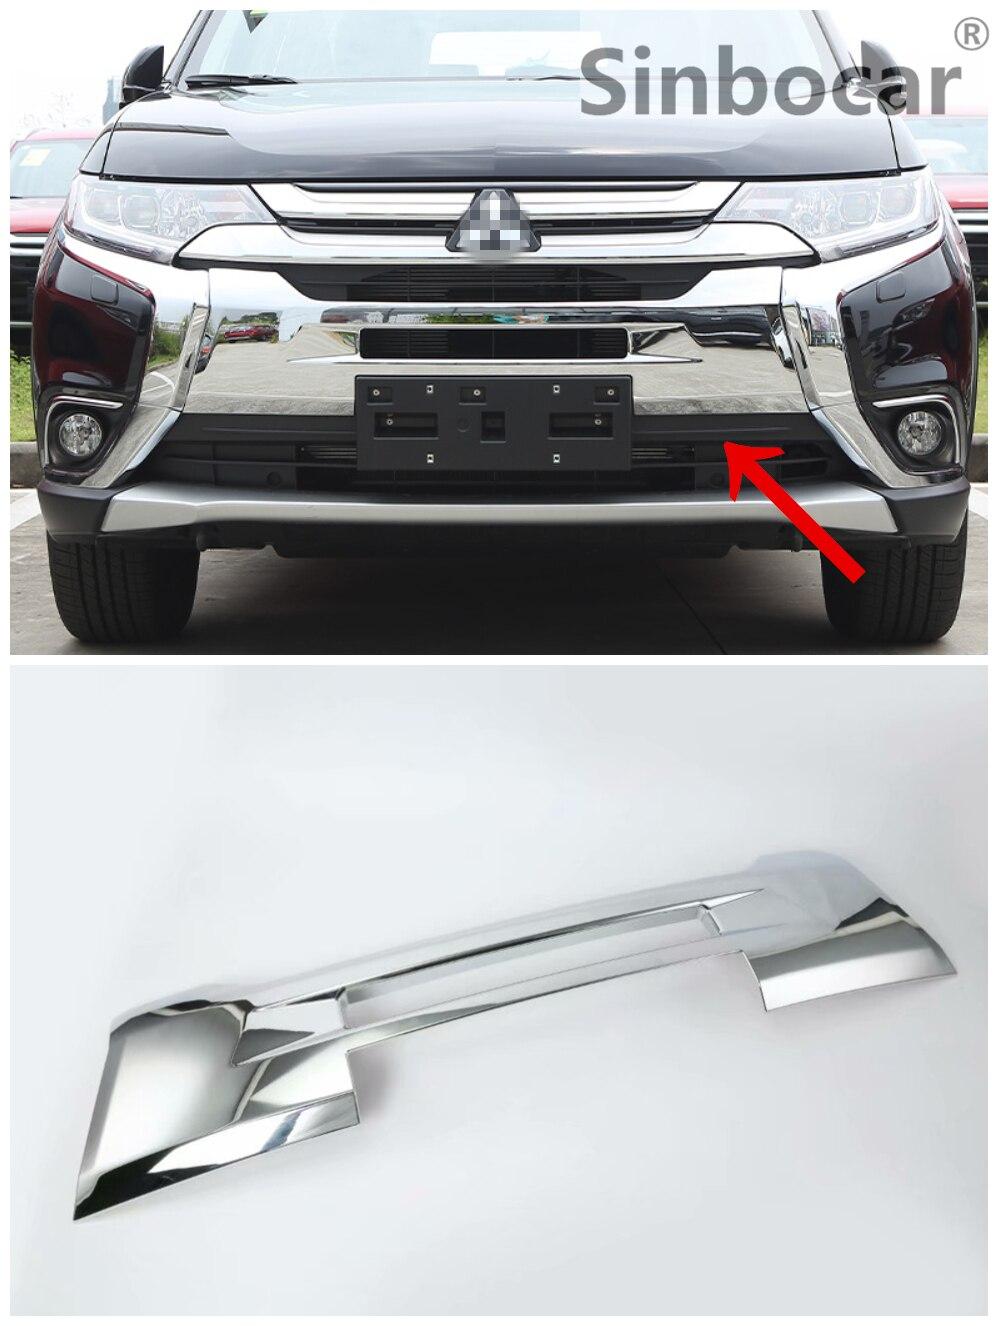 FRONT GRILLE Bumper PANEL Radiator grille for Mitsubishi Outlander 2016-2017